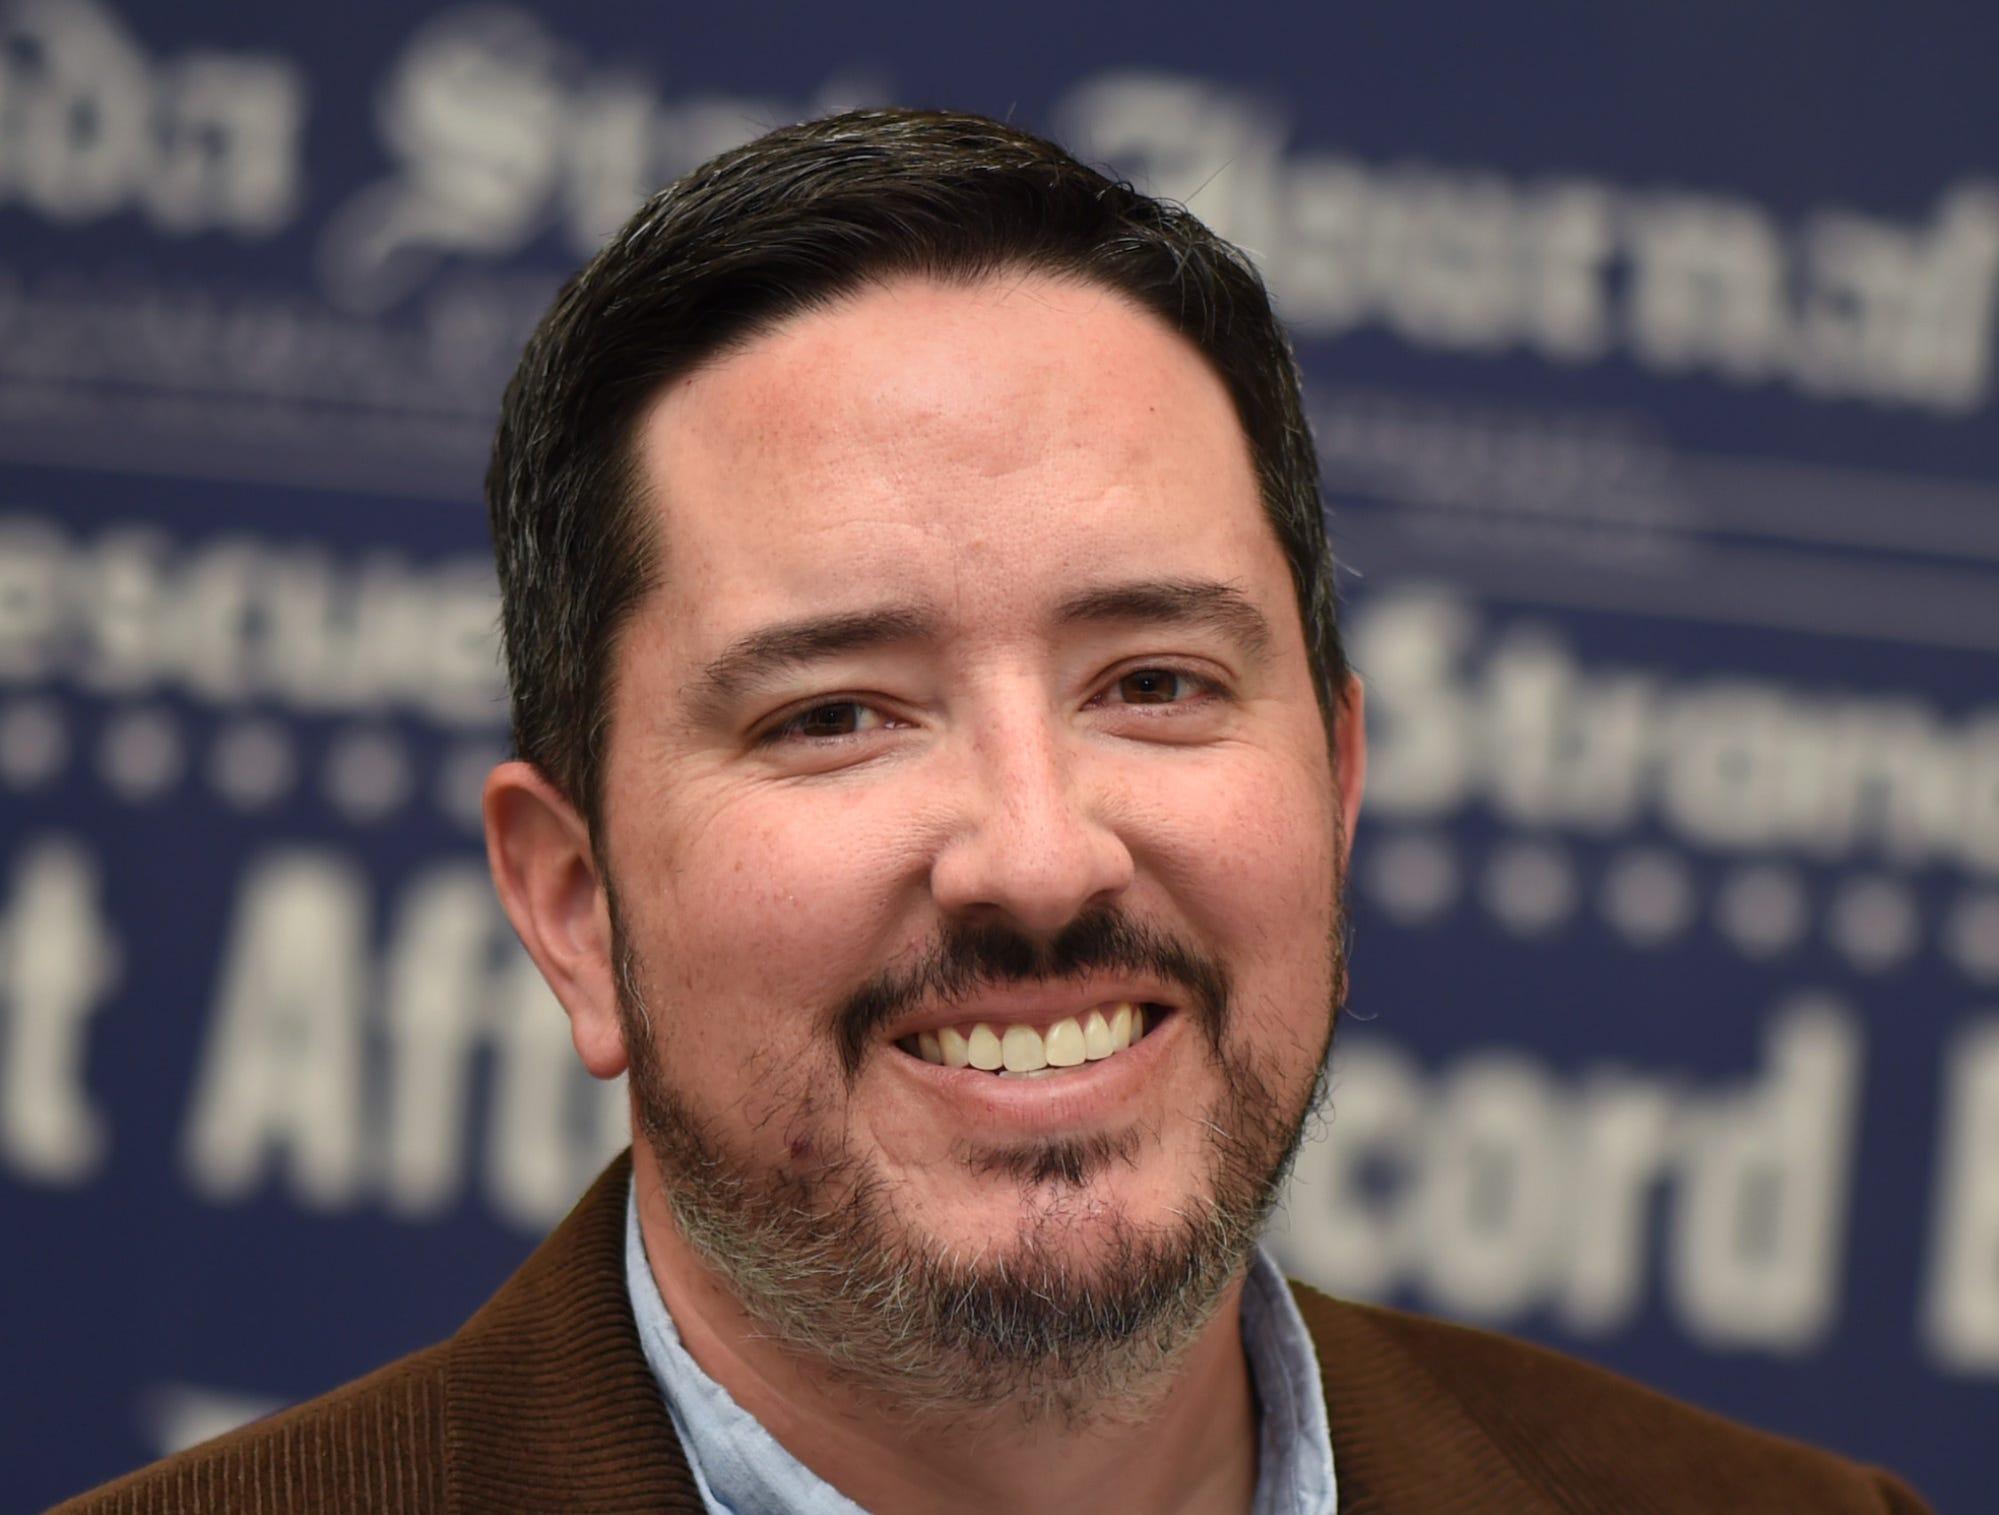 Brett McGinness, engagement and opinion editor